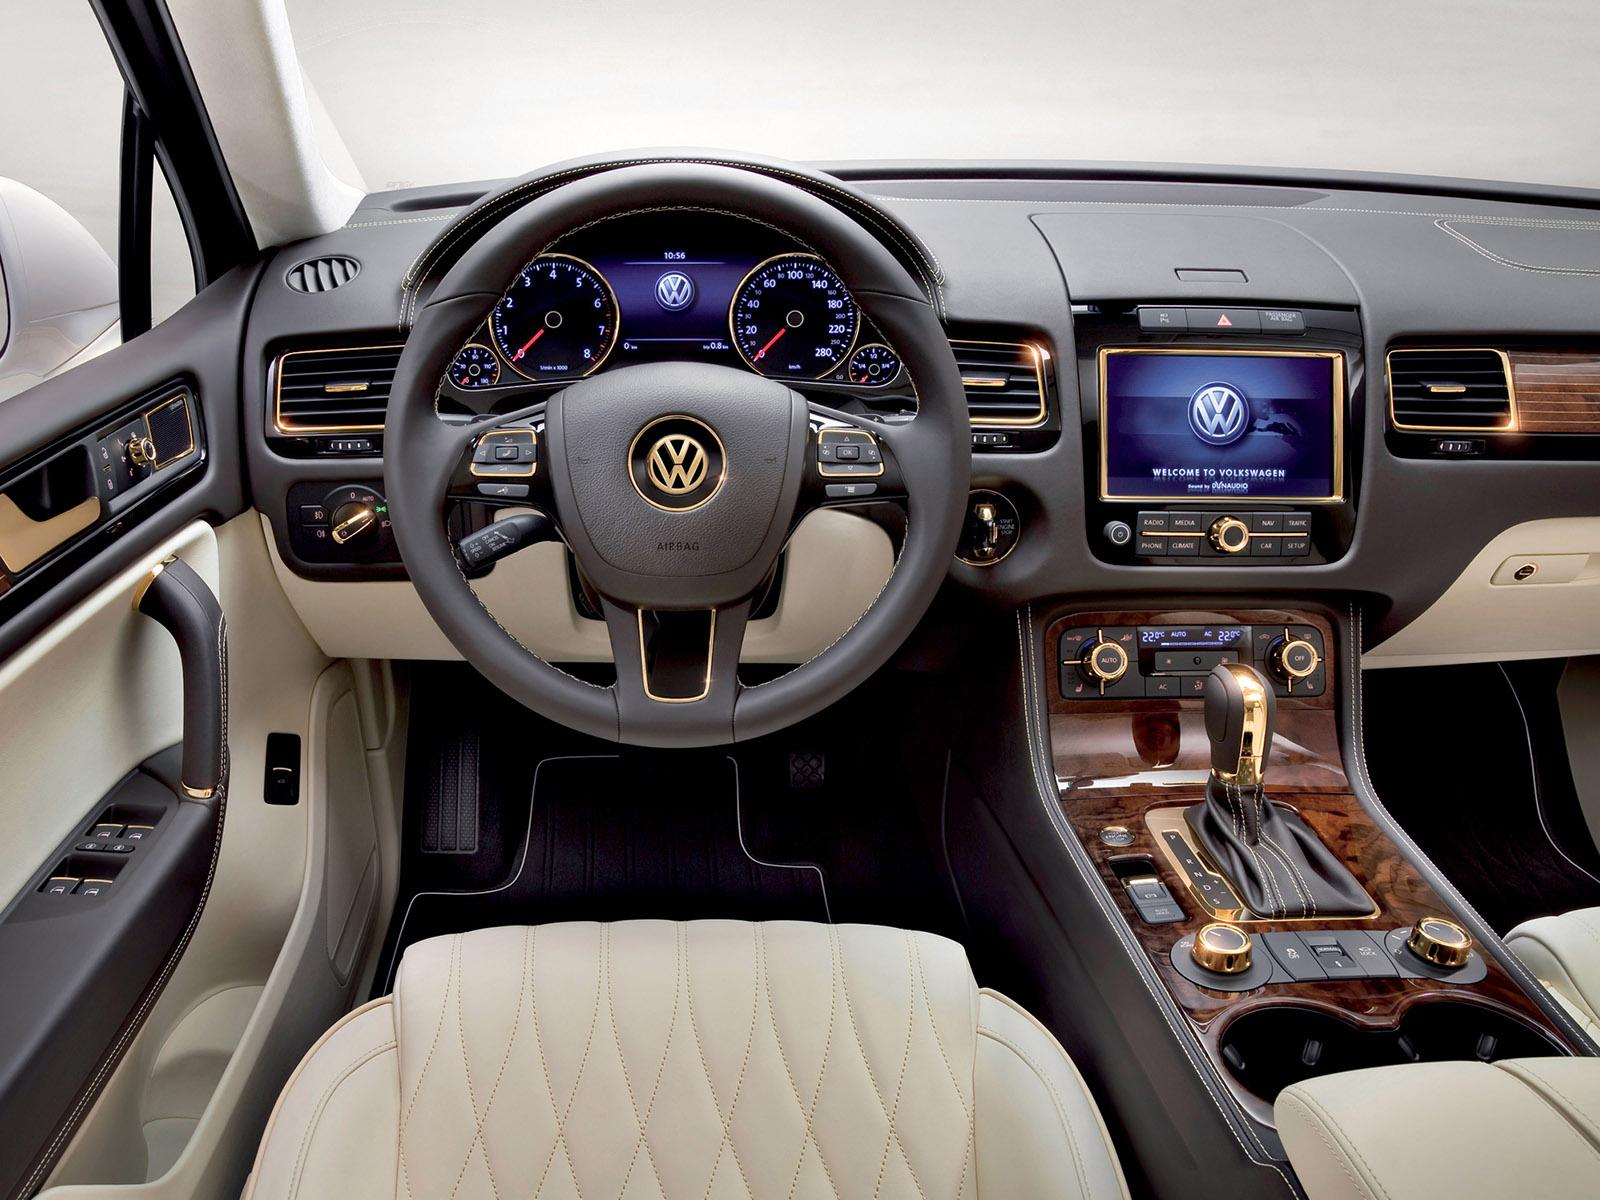 VW Touareg V8 TDI technical details history photos on Better